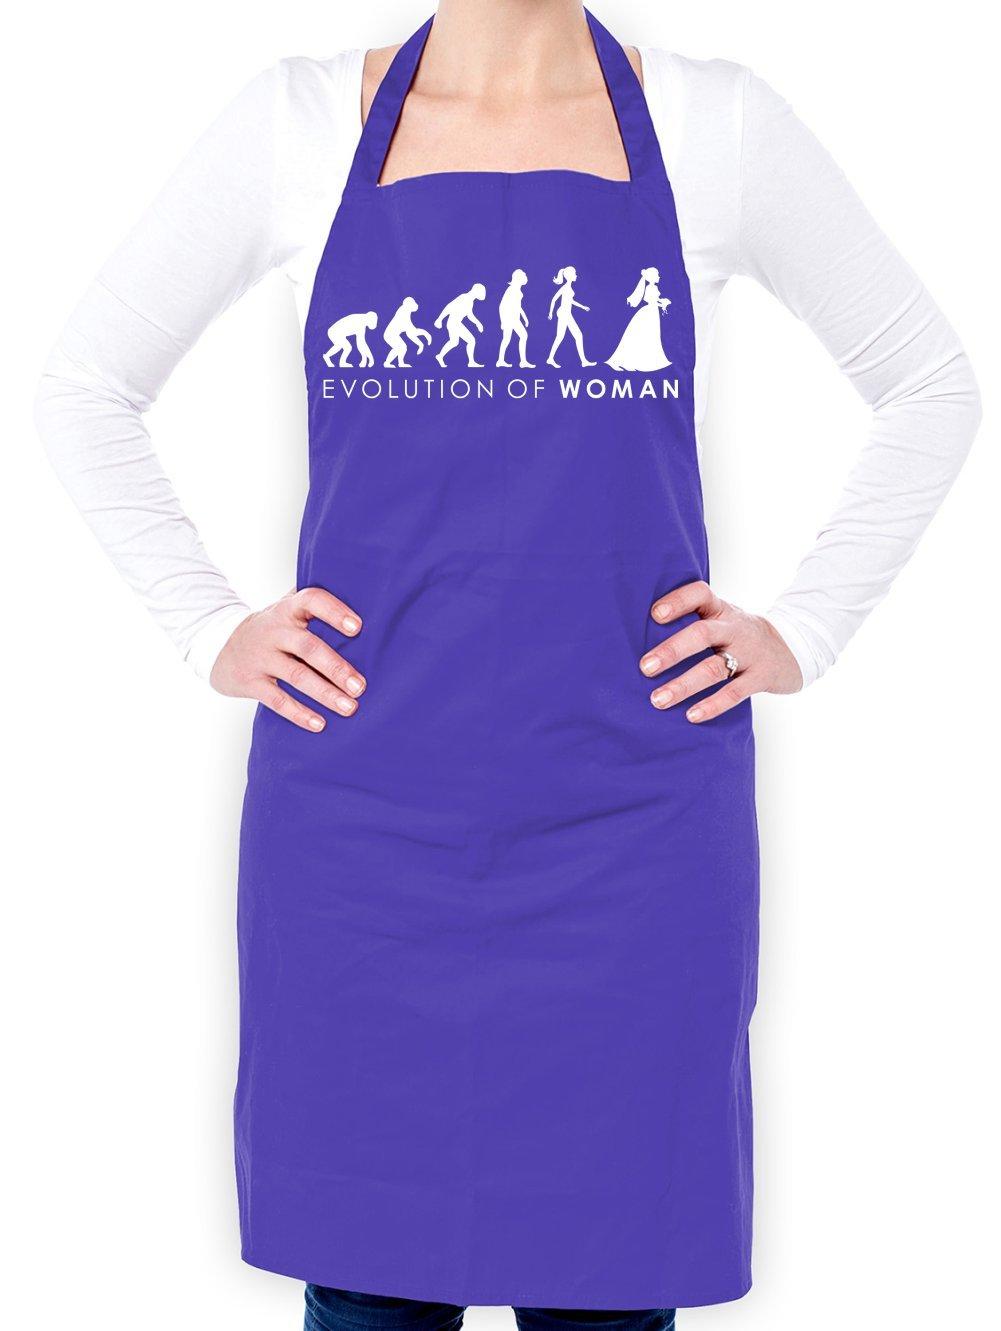 Dressdown Evolution of Woman - Bride - Unisex Adult Apron - Purple - One Size